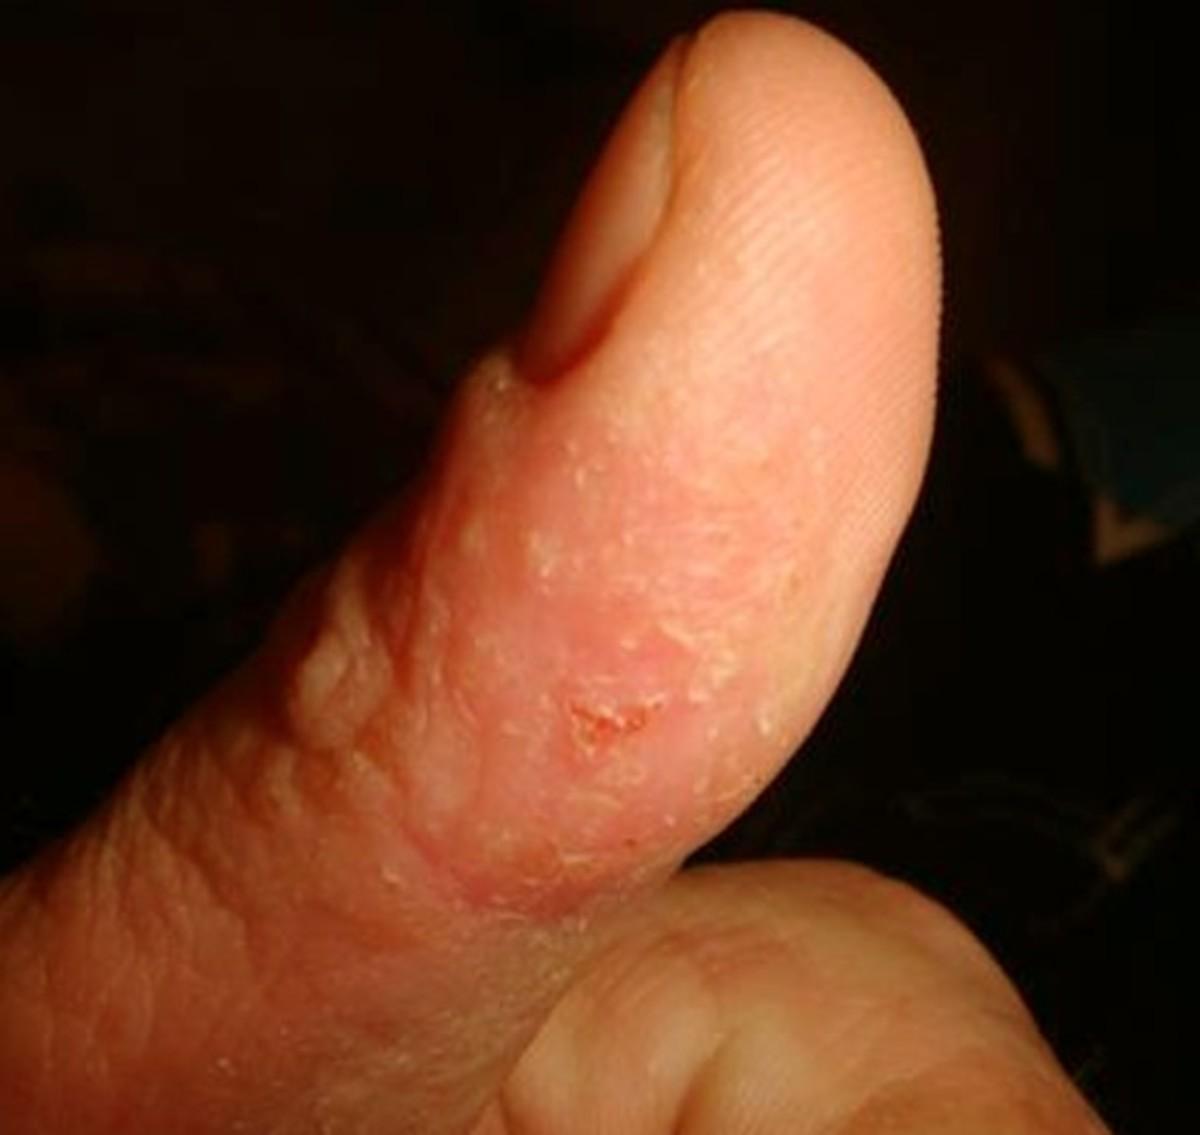 contact-dermatitis-pictures-symptoms-causes-treatment